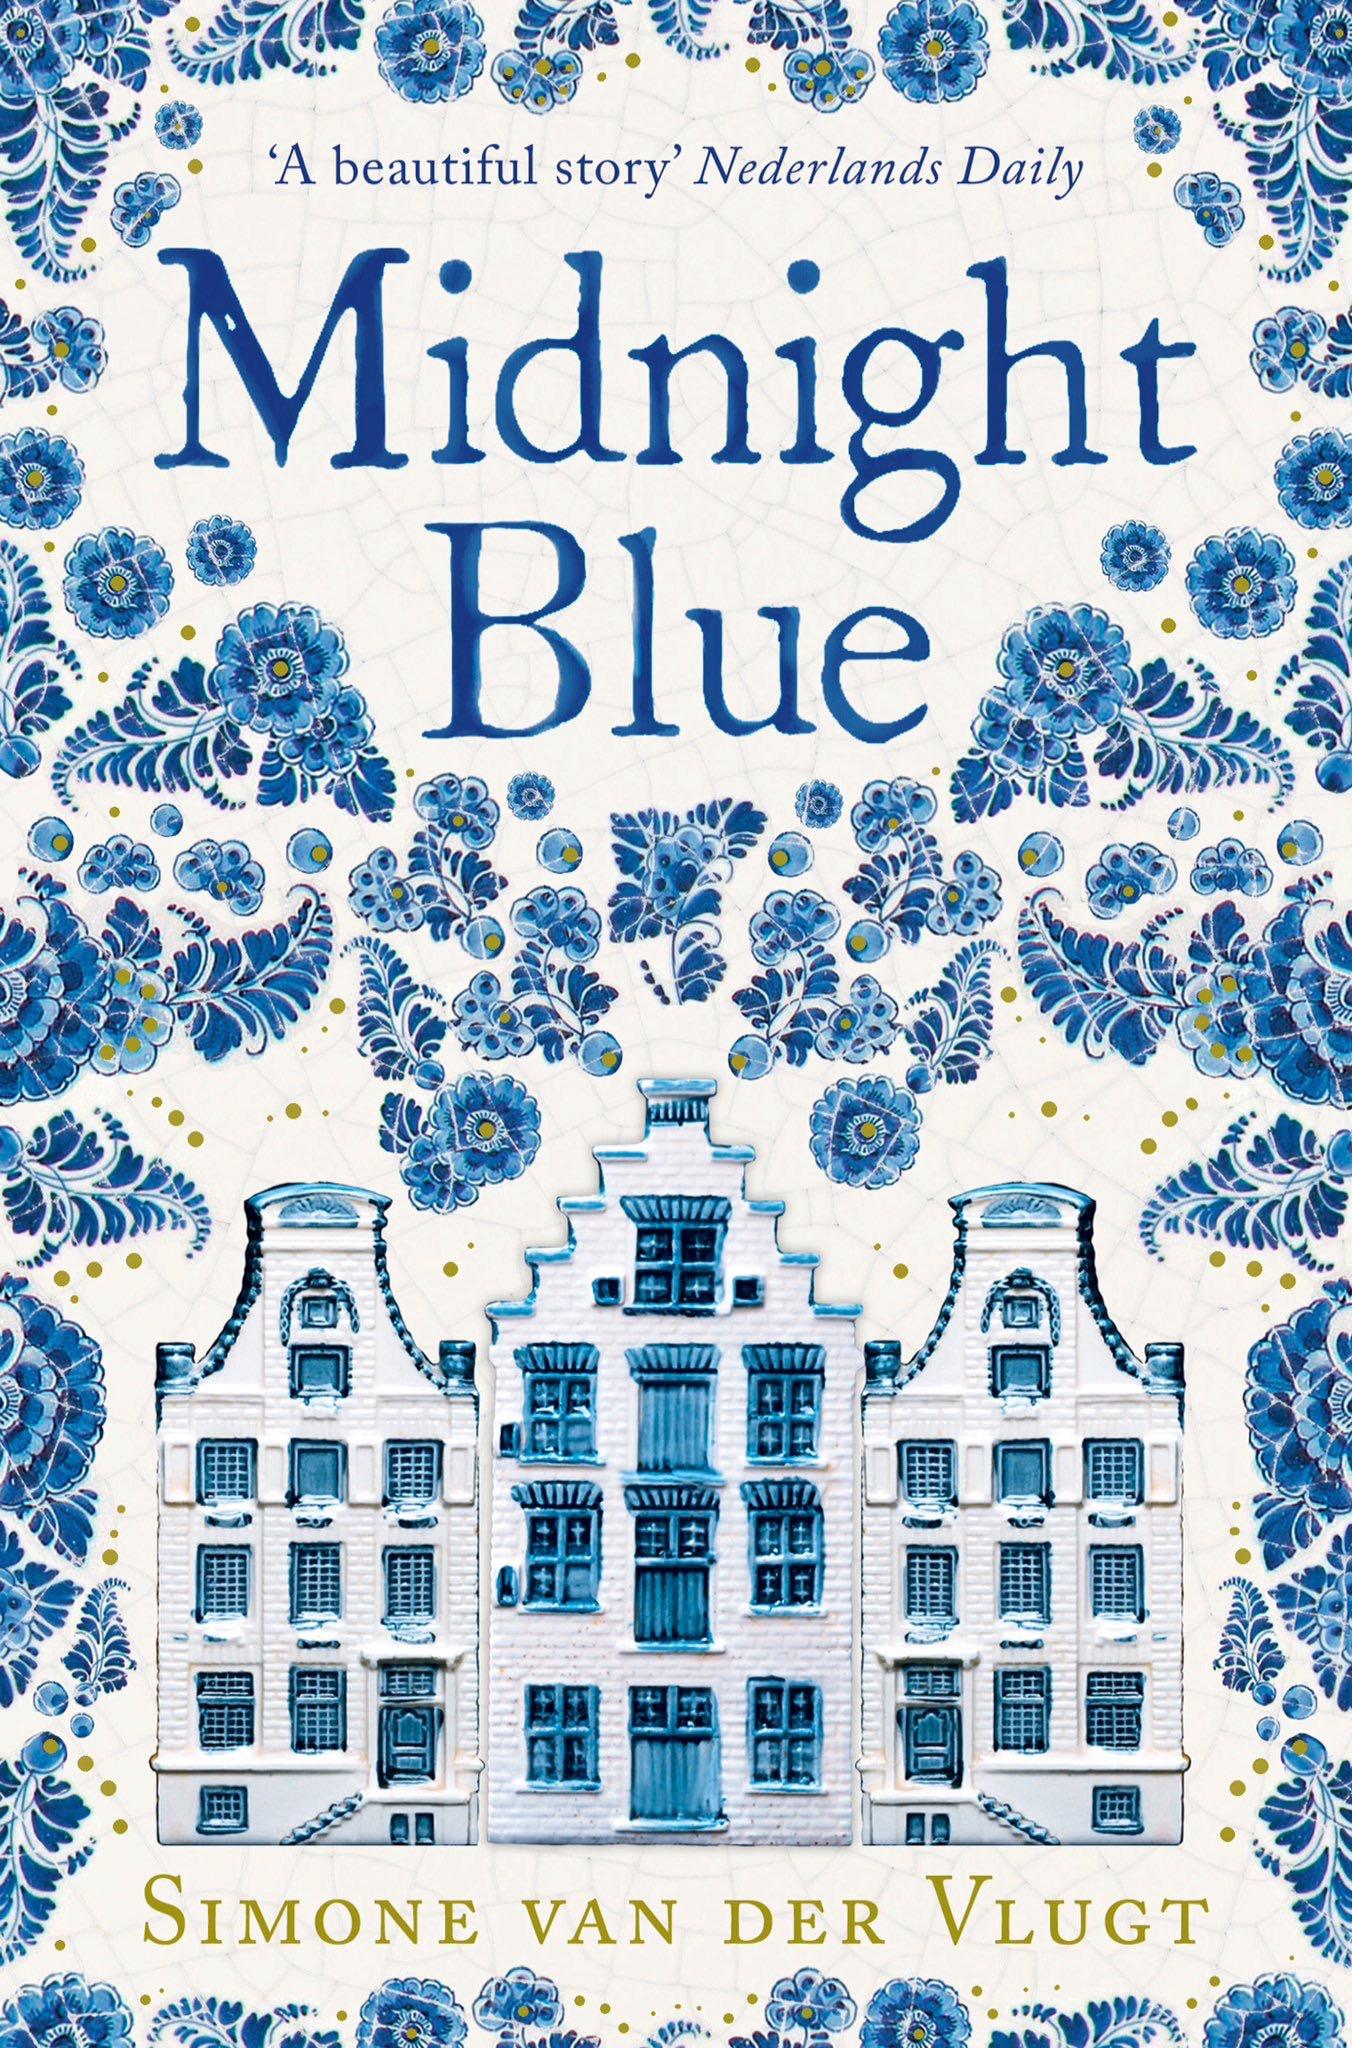 Book Review: Midnight Blue by Simone van der Vlugt